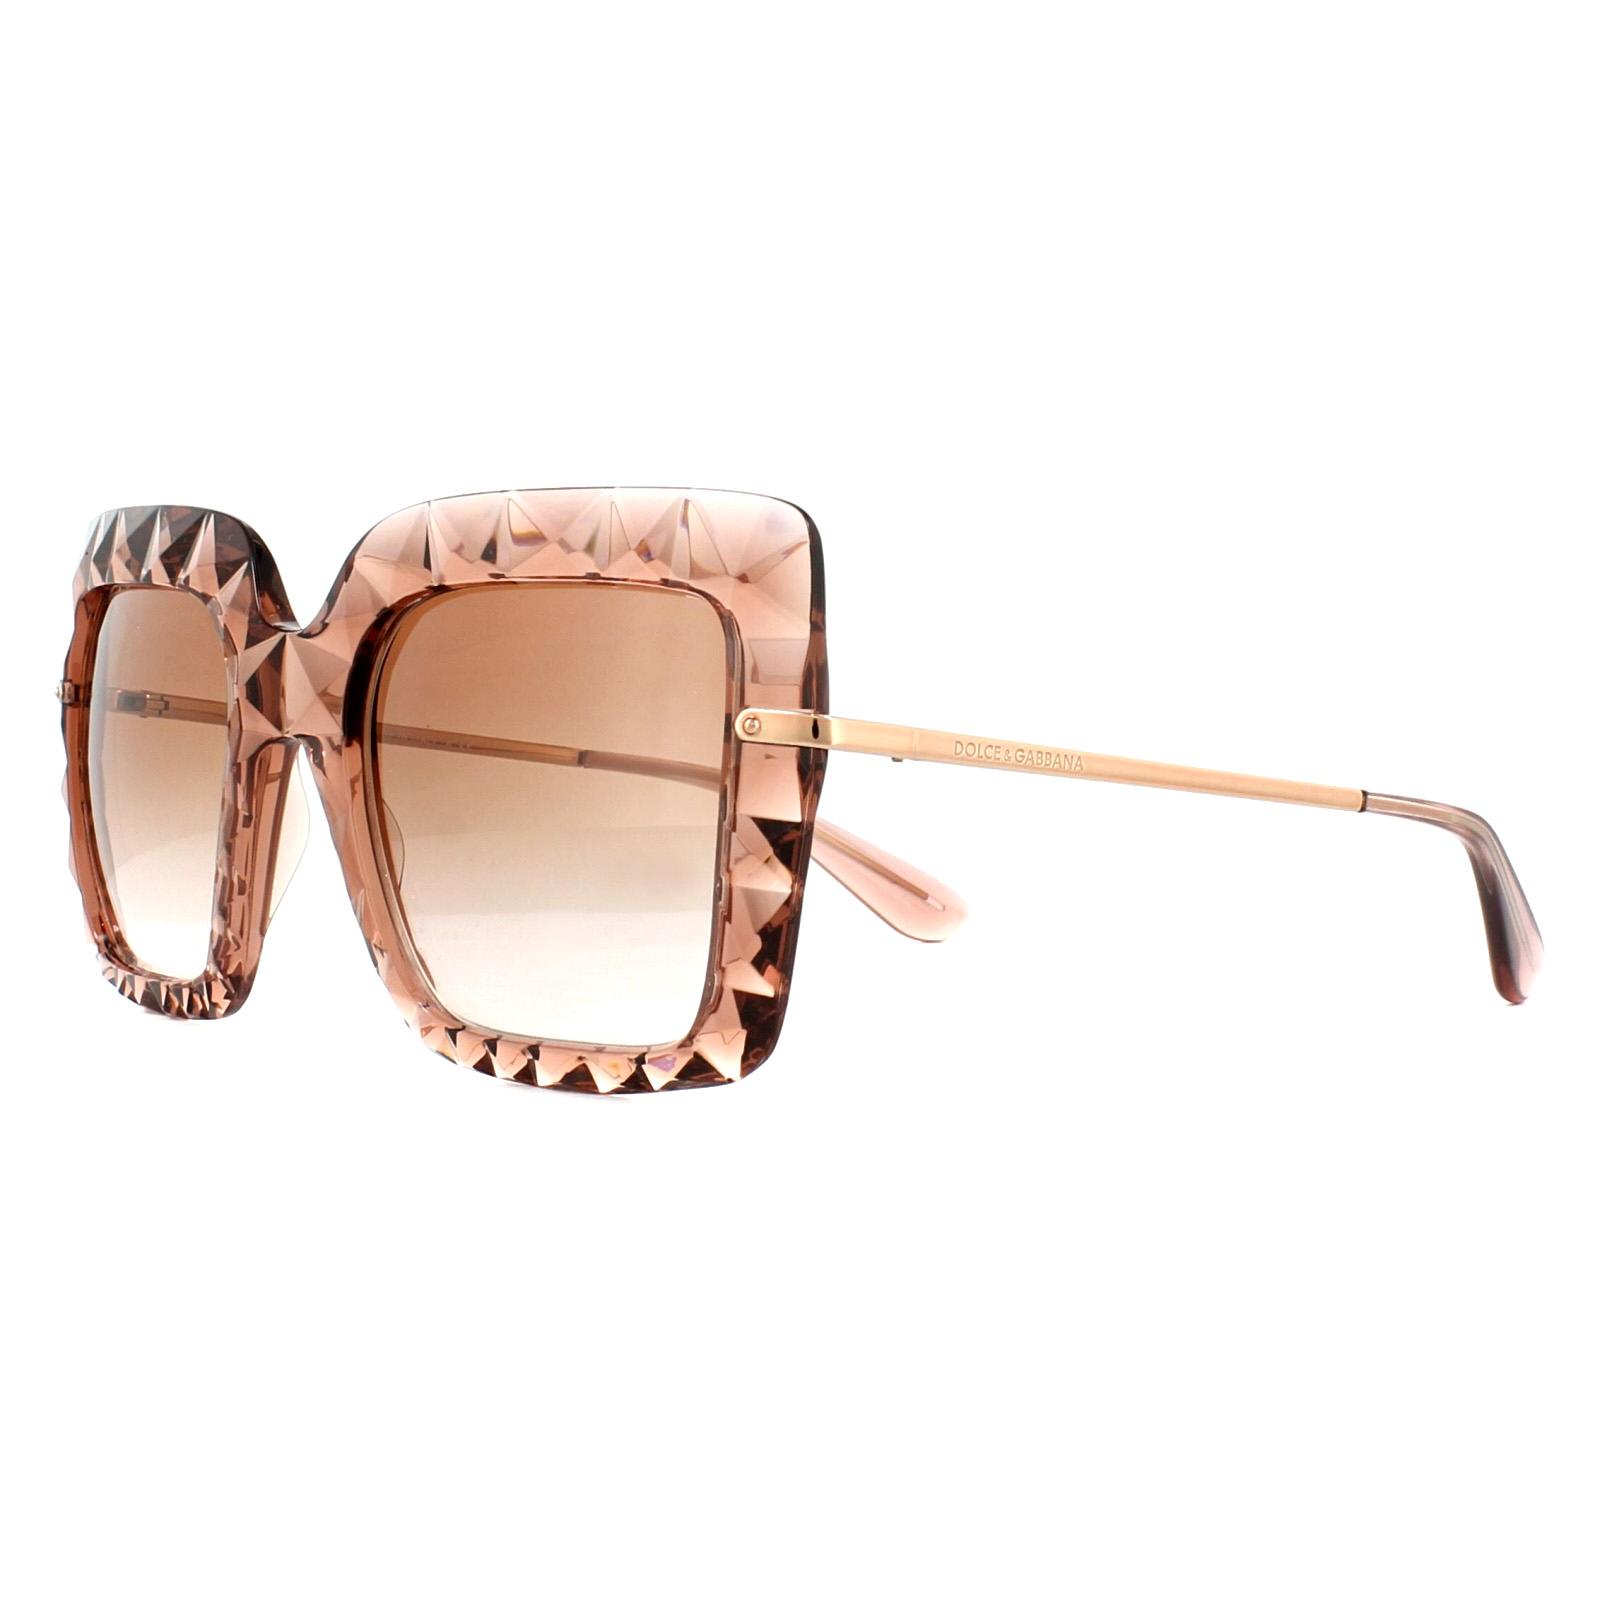 3d032a5adef Sentinel Dolce   Gabbana Sunglasses DG6111 314813 Pink Gold Pink Gradient